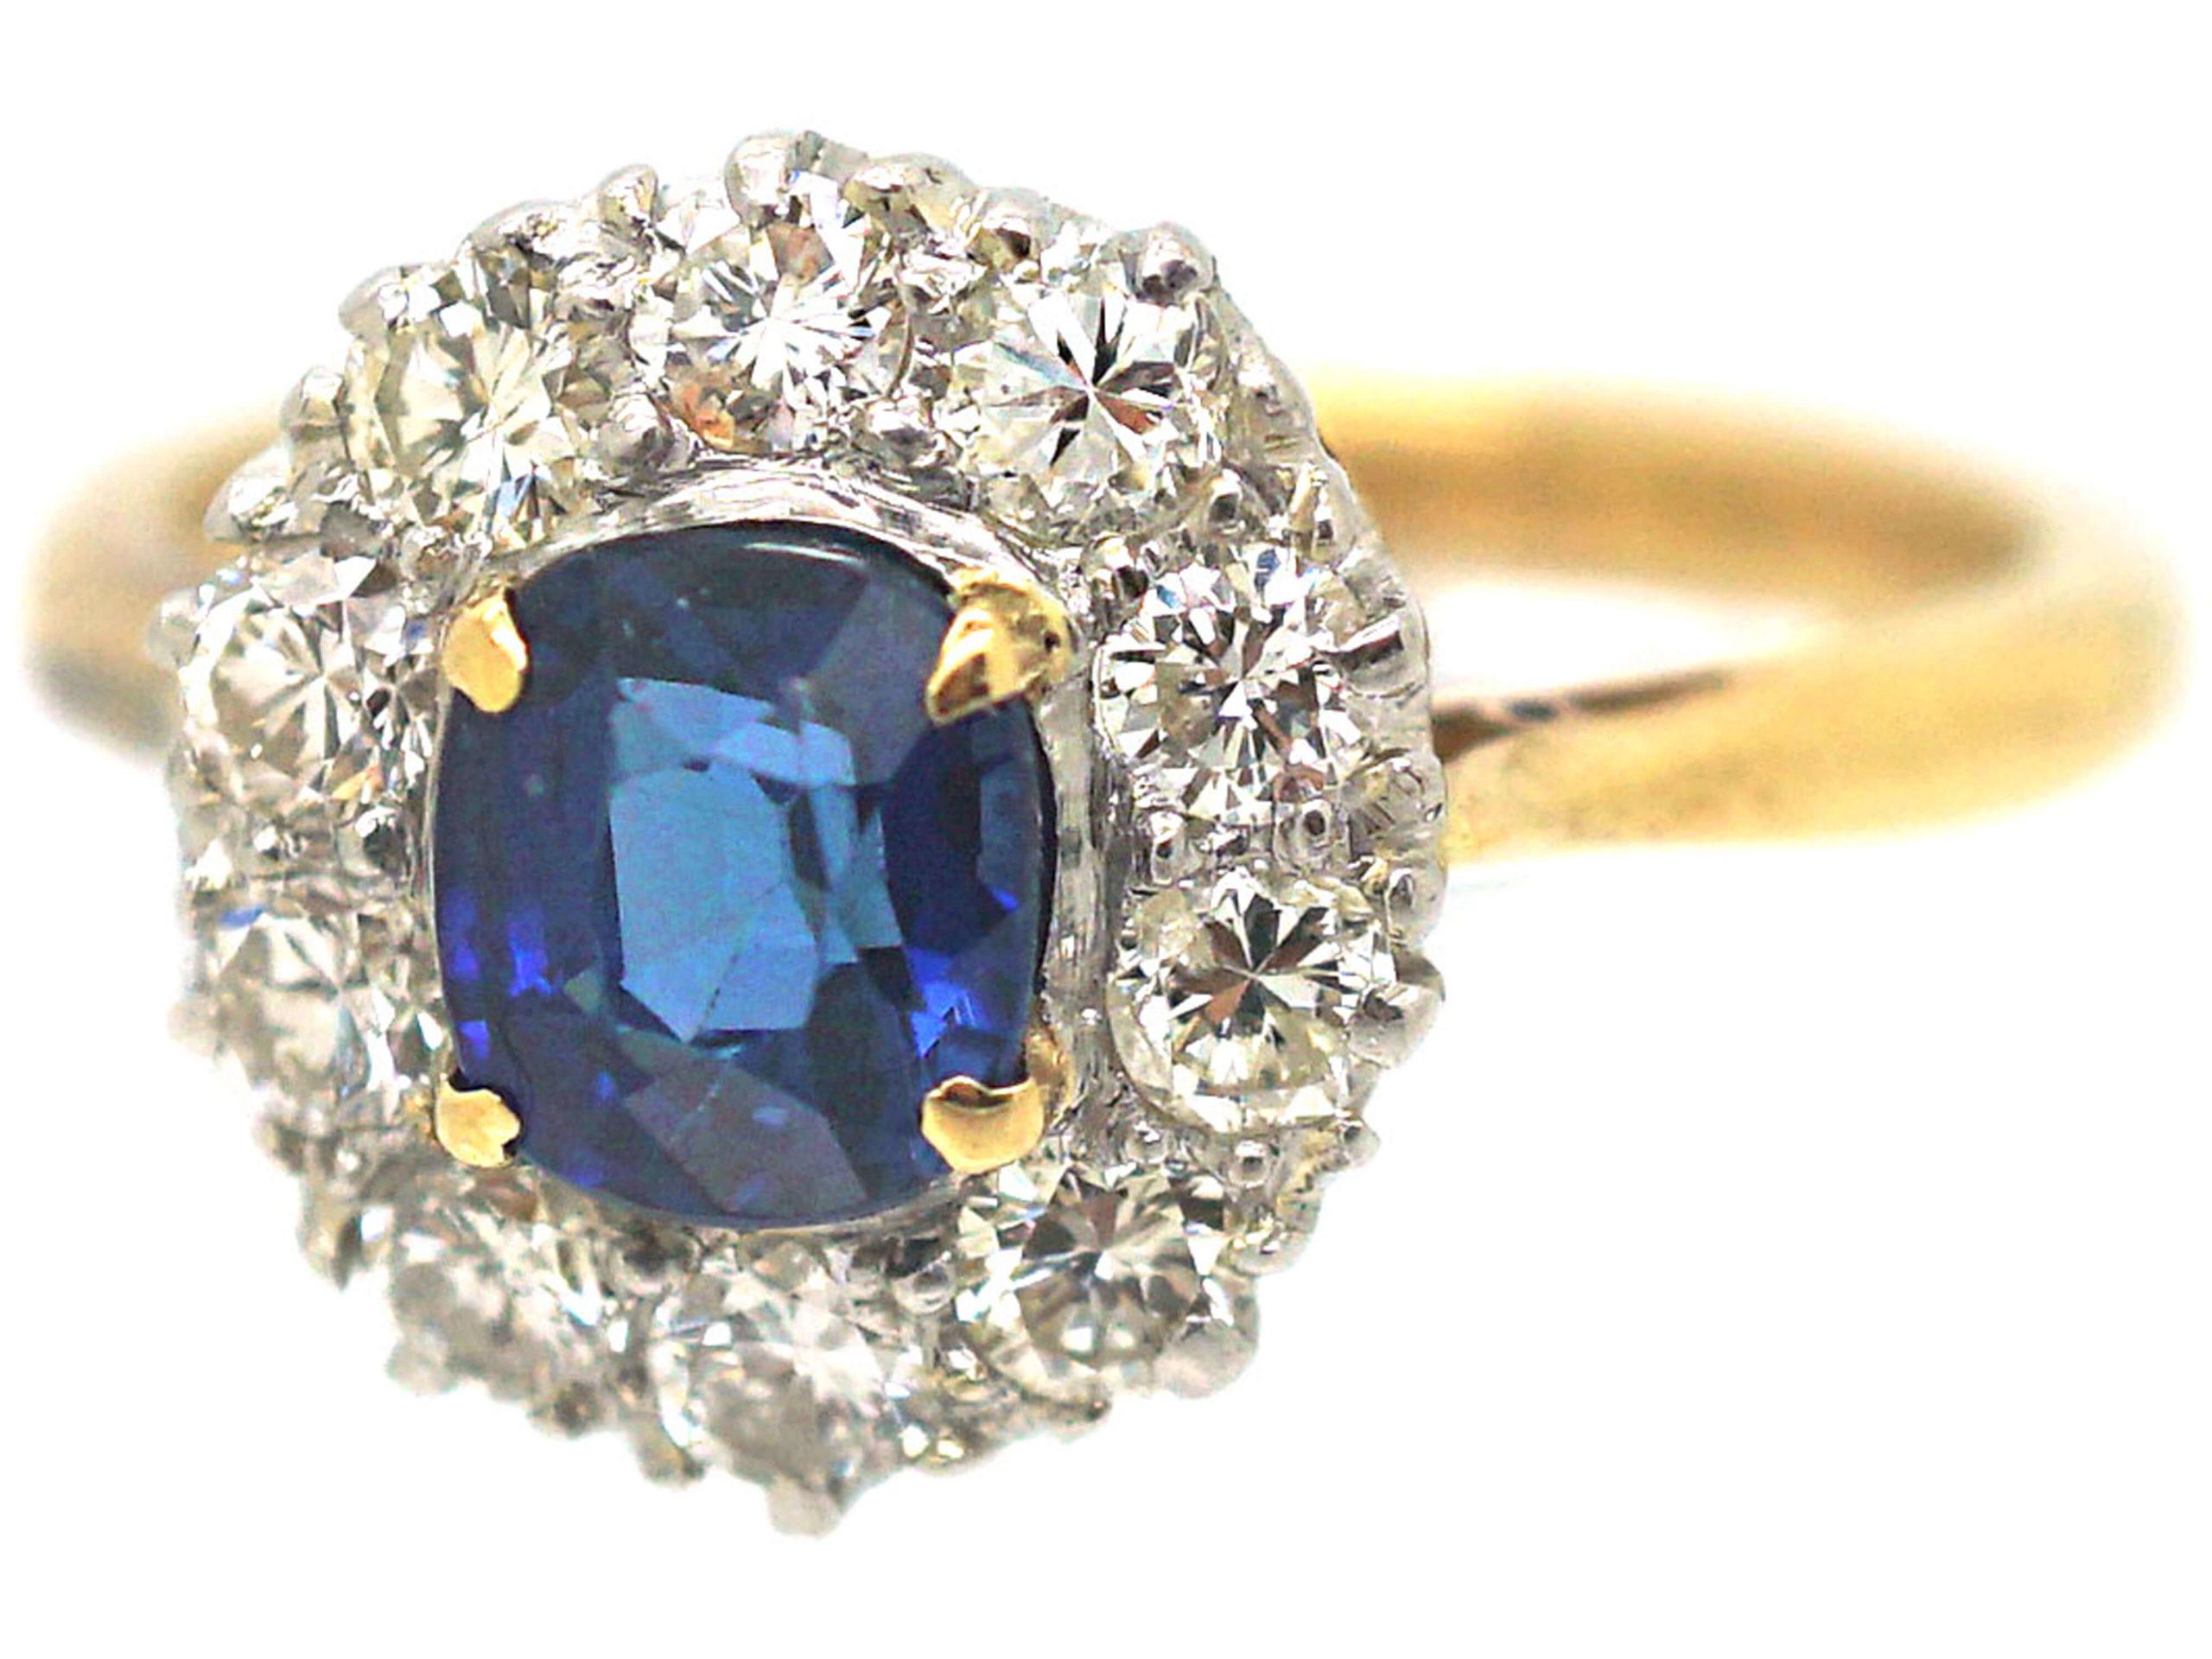 18ct Gold & Platinum, Sapphire & Diamond Cluster Ring